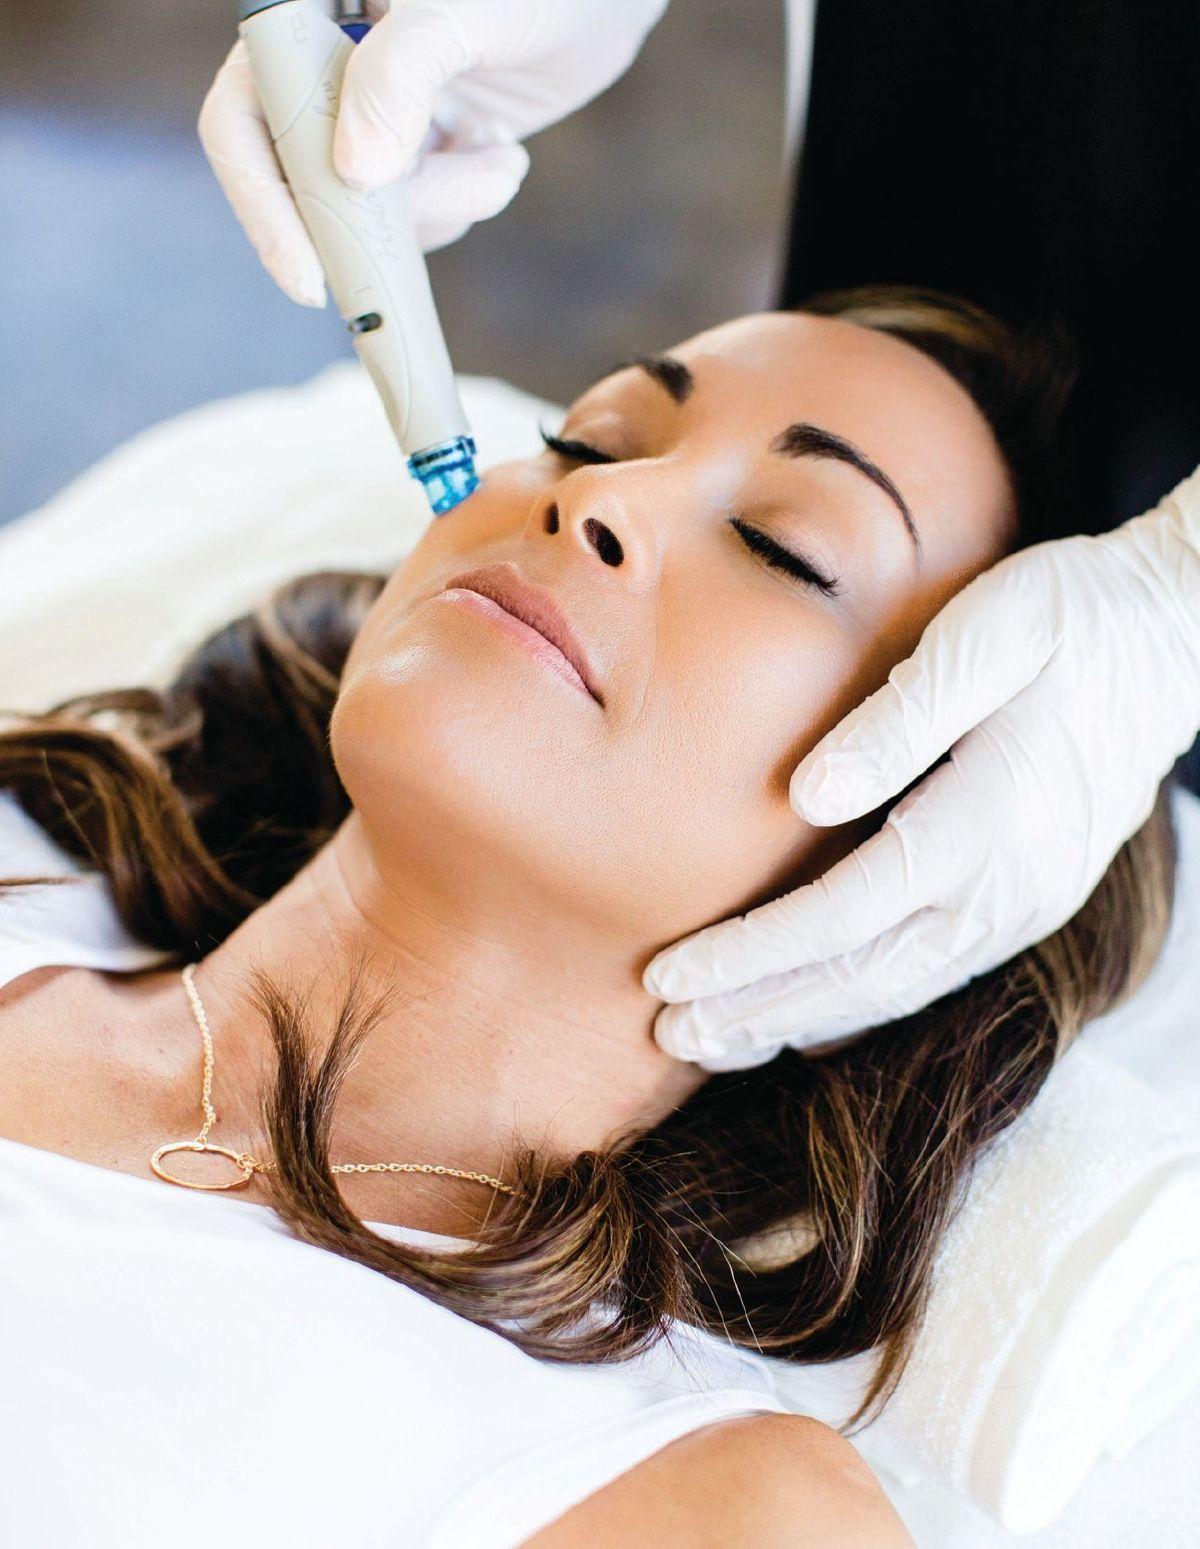 Https Www Bluetoad Com Publication M 44604 L 1 22issue Id 22 642295 22publication Id 22 2244604 22 22pag In 2020 Hydra Facial Skin Treatments Facial Aesthetics